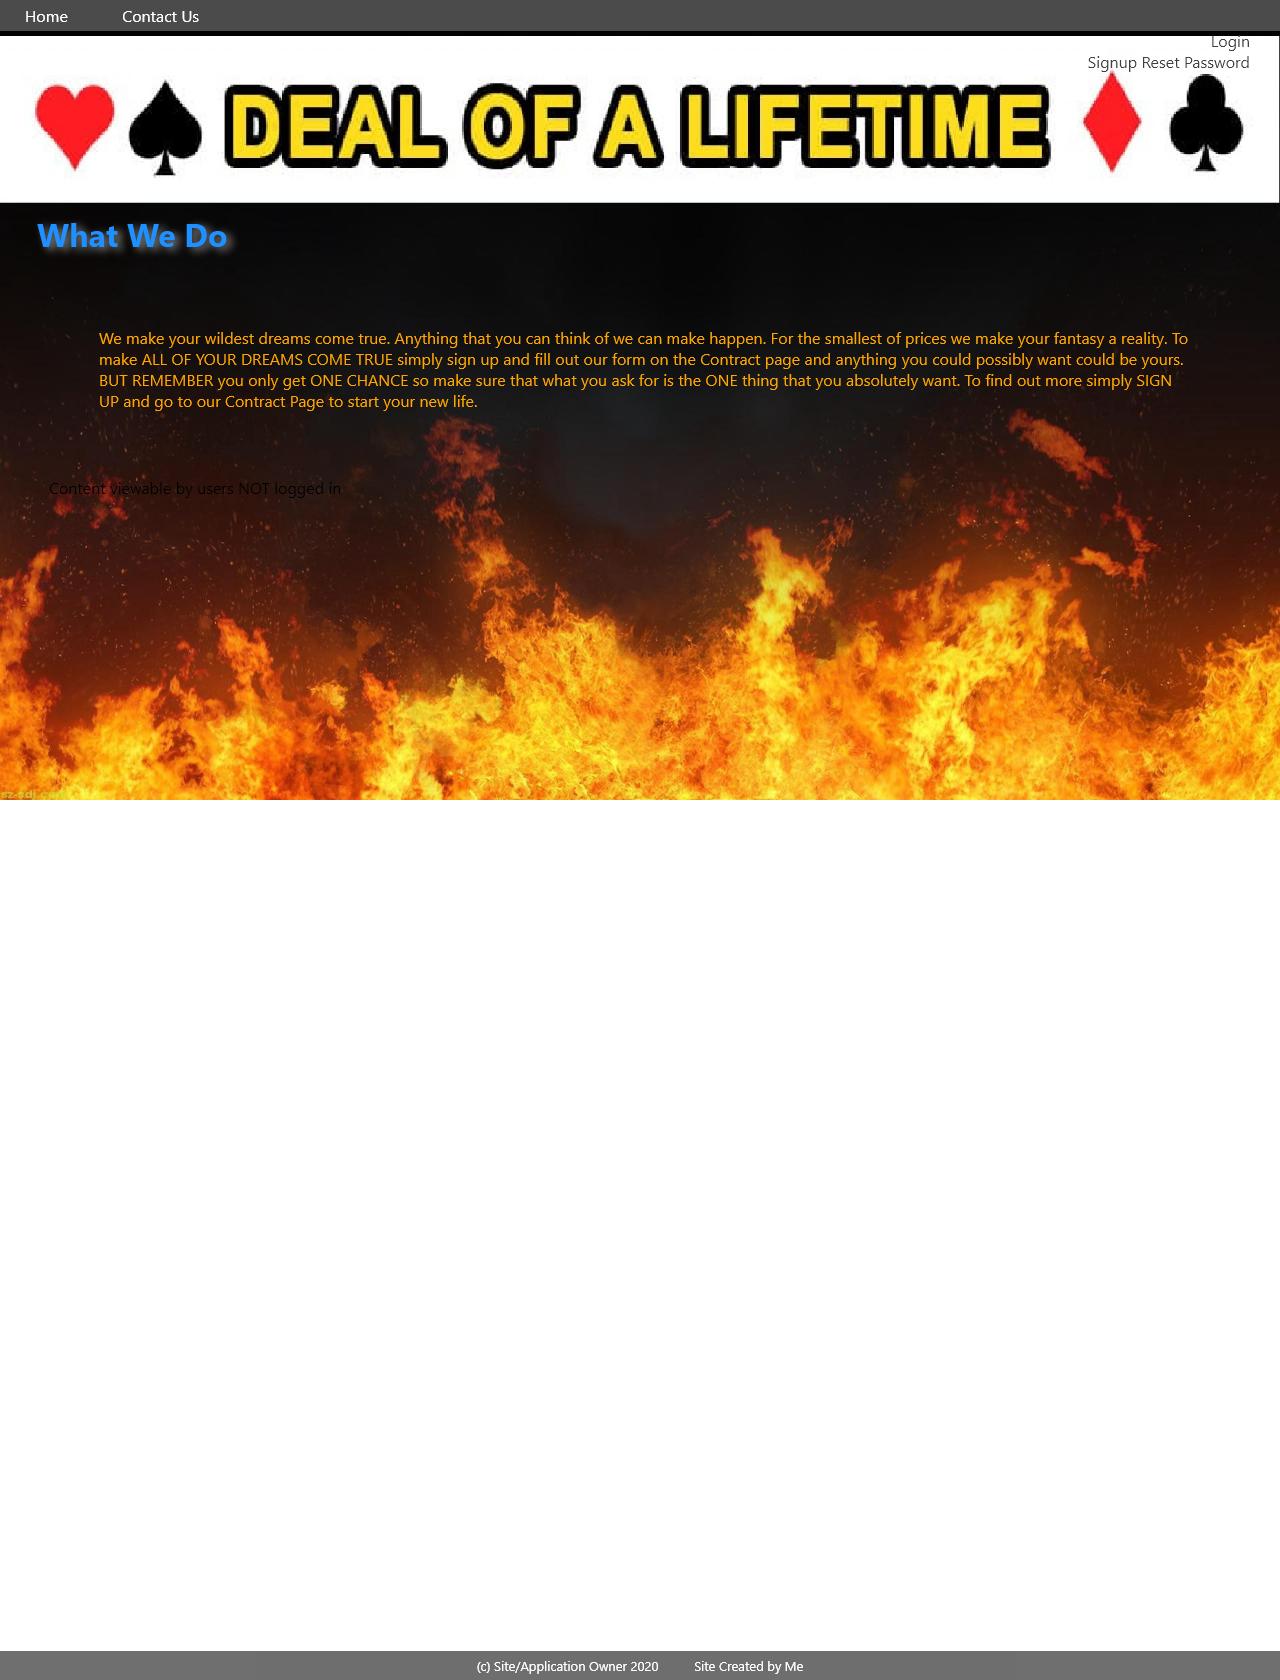 Screenshot Desktop - https://cs0010.cert4cyber.online/